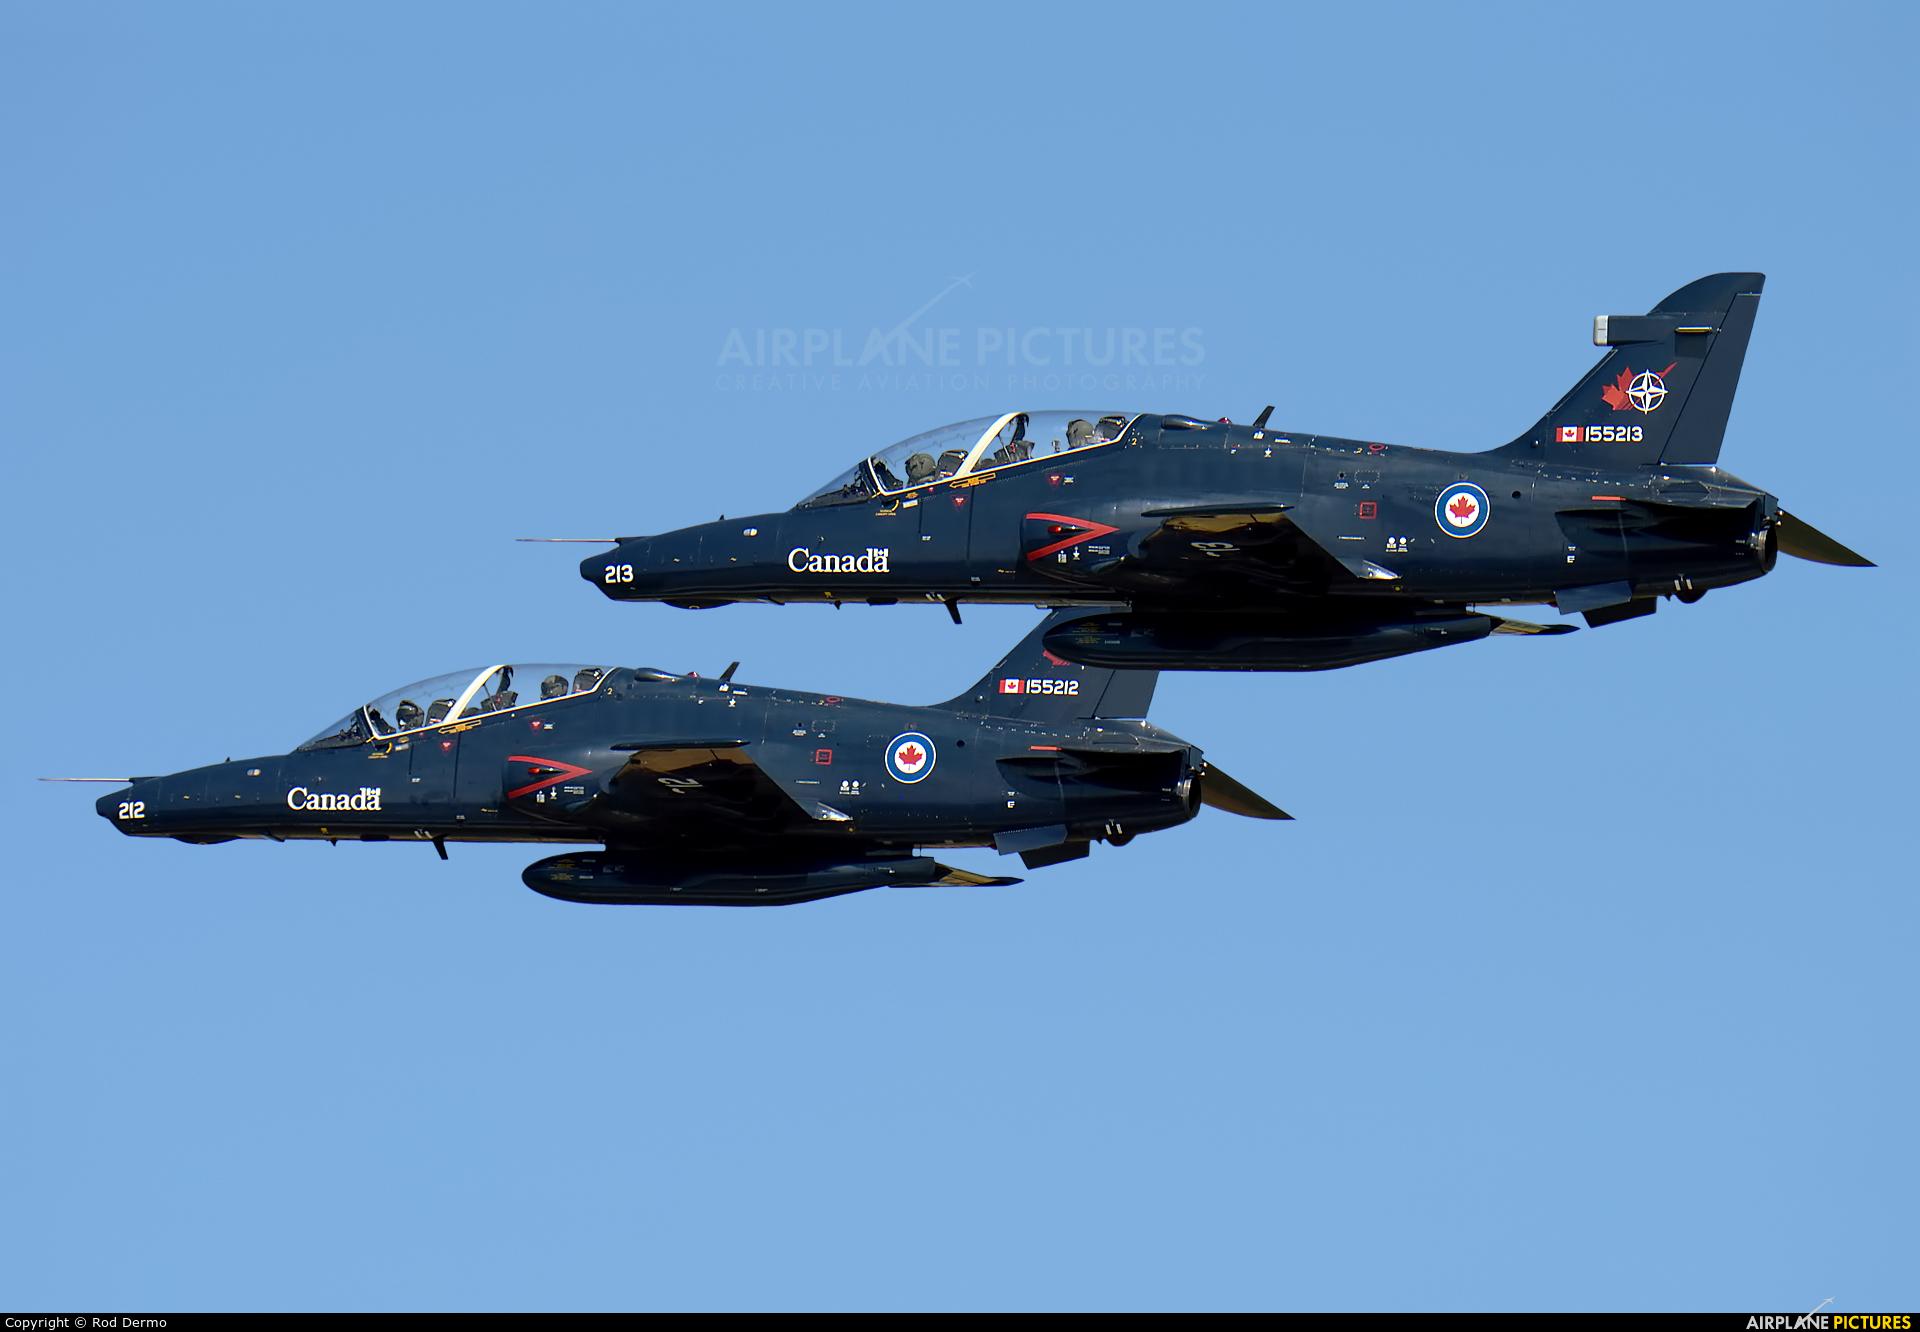 Canada - Air Force 155213 aircraft at London  Intl, ON